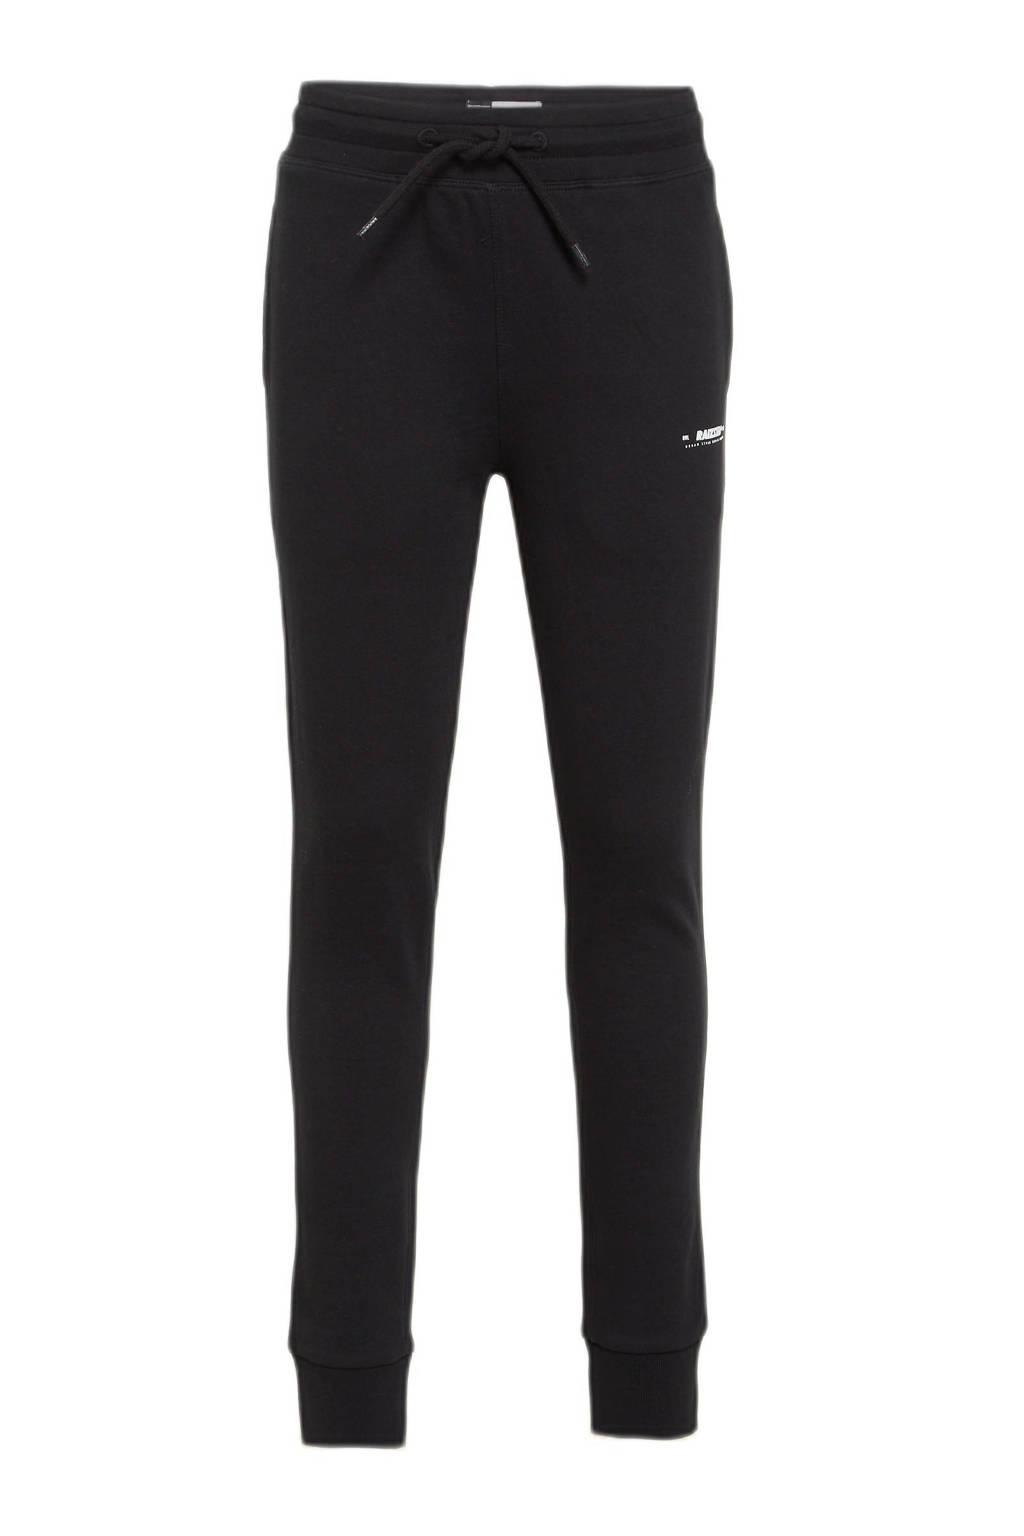 Raizzed skinny joggingbroek Sabot zwart, Zwart